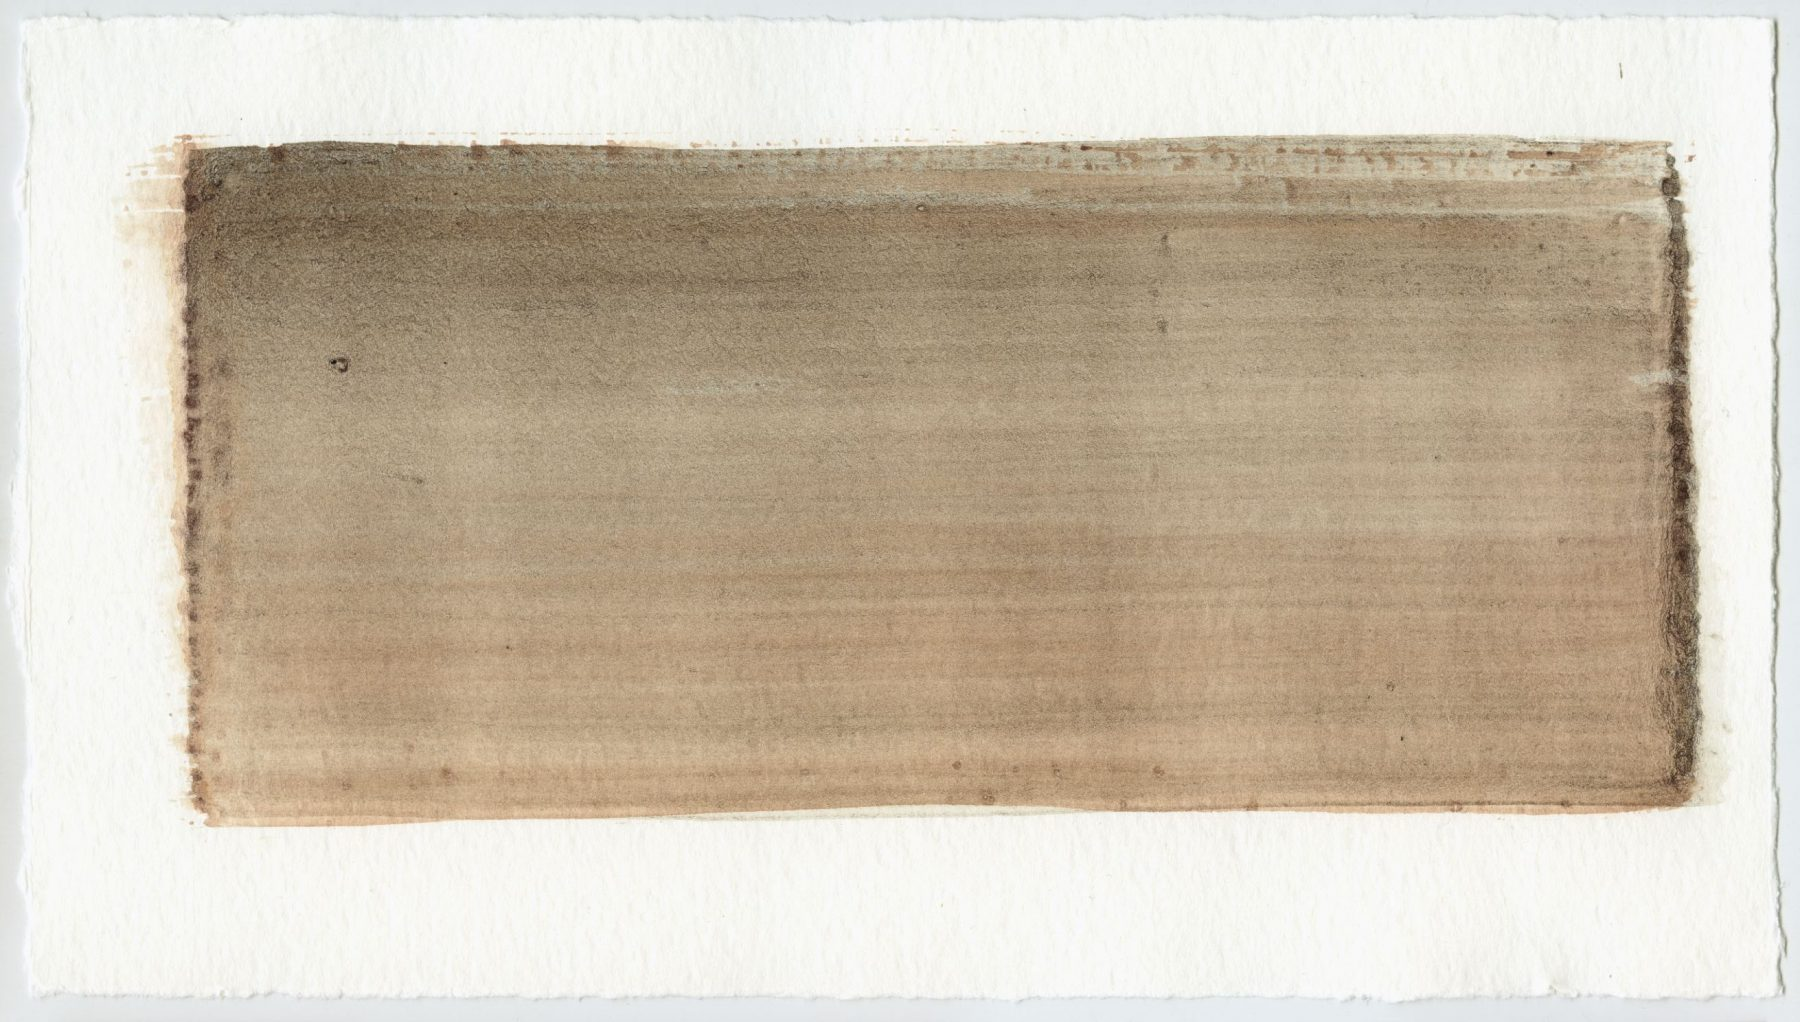 Brush stroke no. 115 - Selfmade pigment: IJzeroer gebrand, Slingerpad bruin